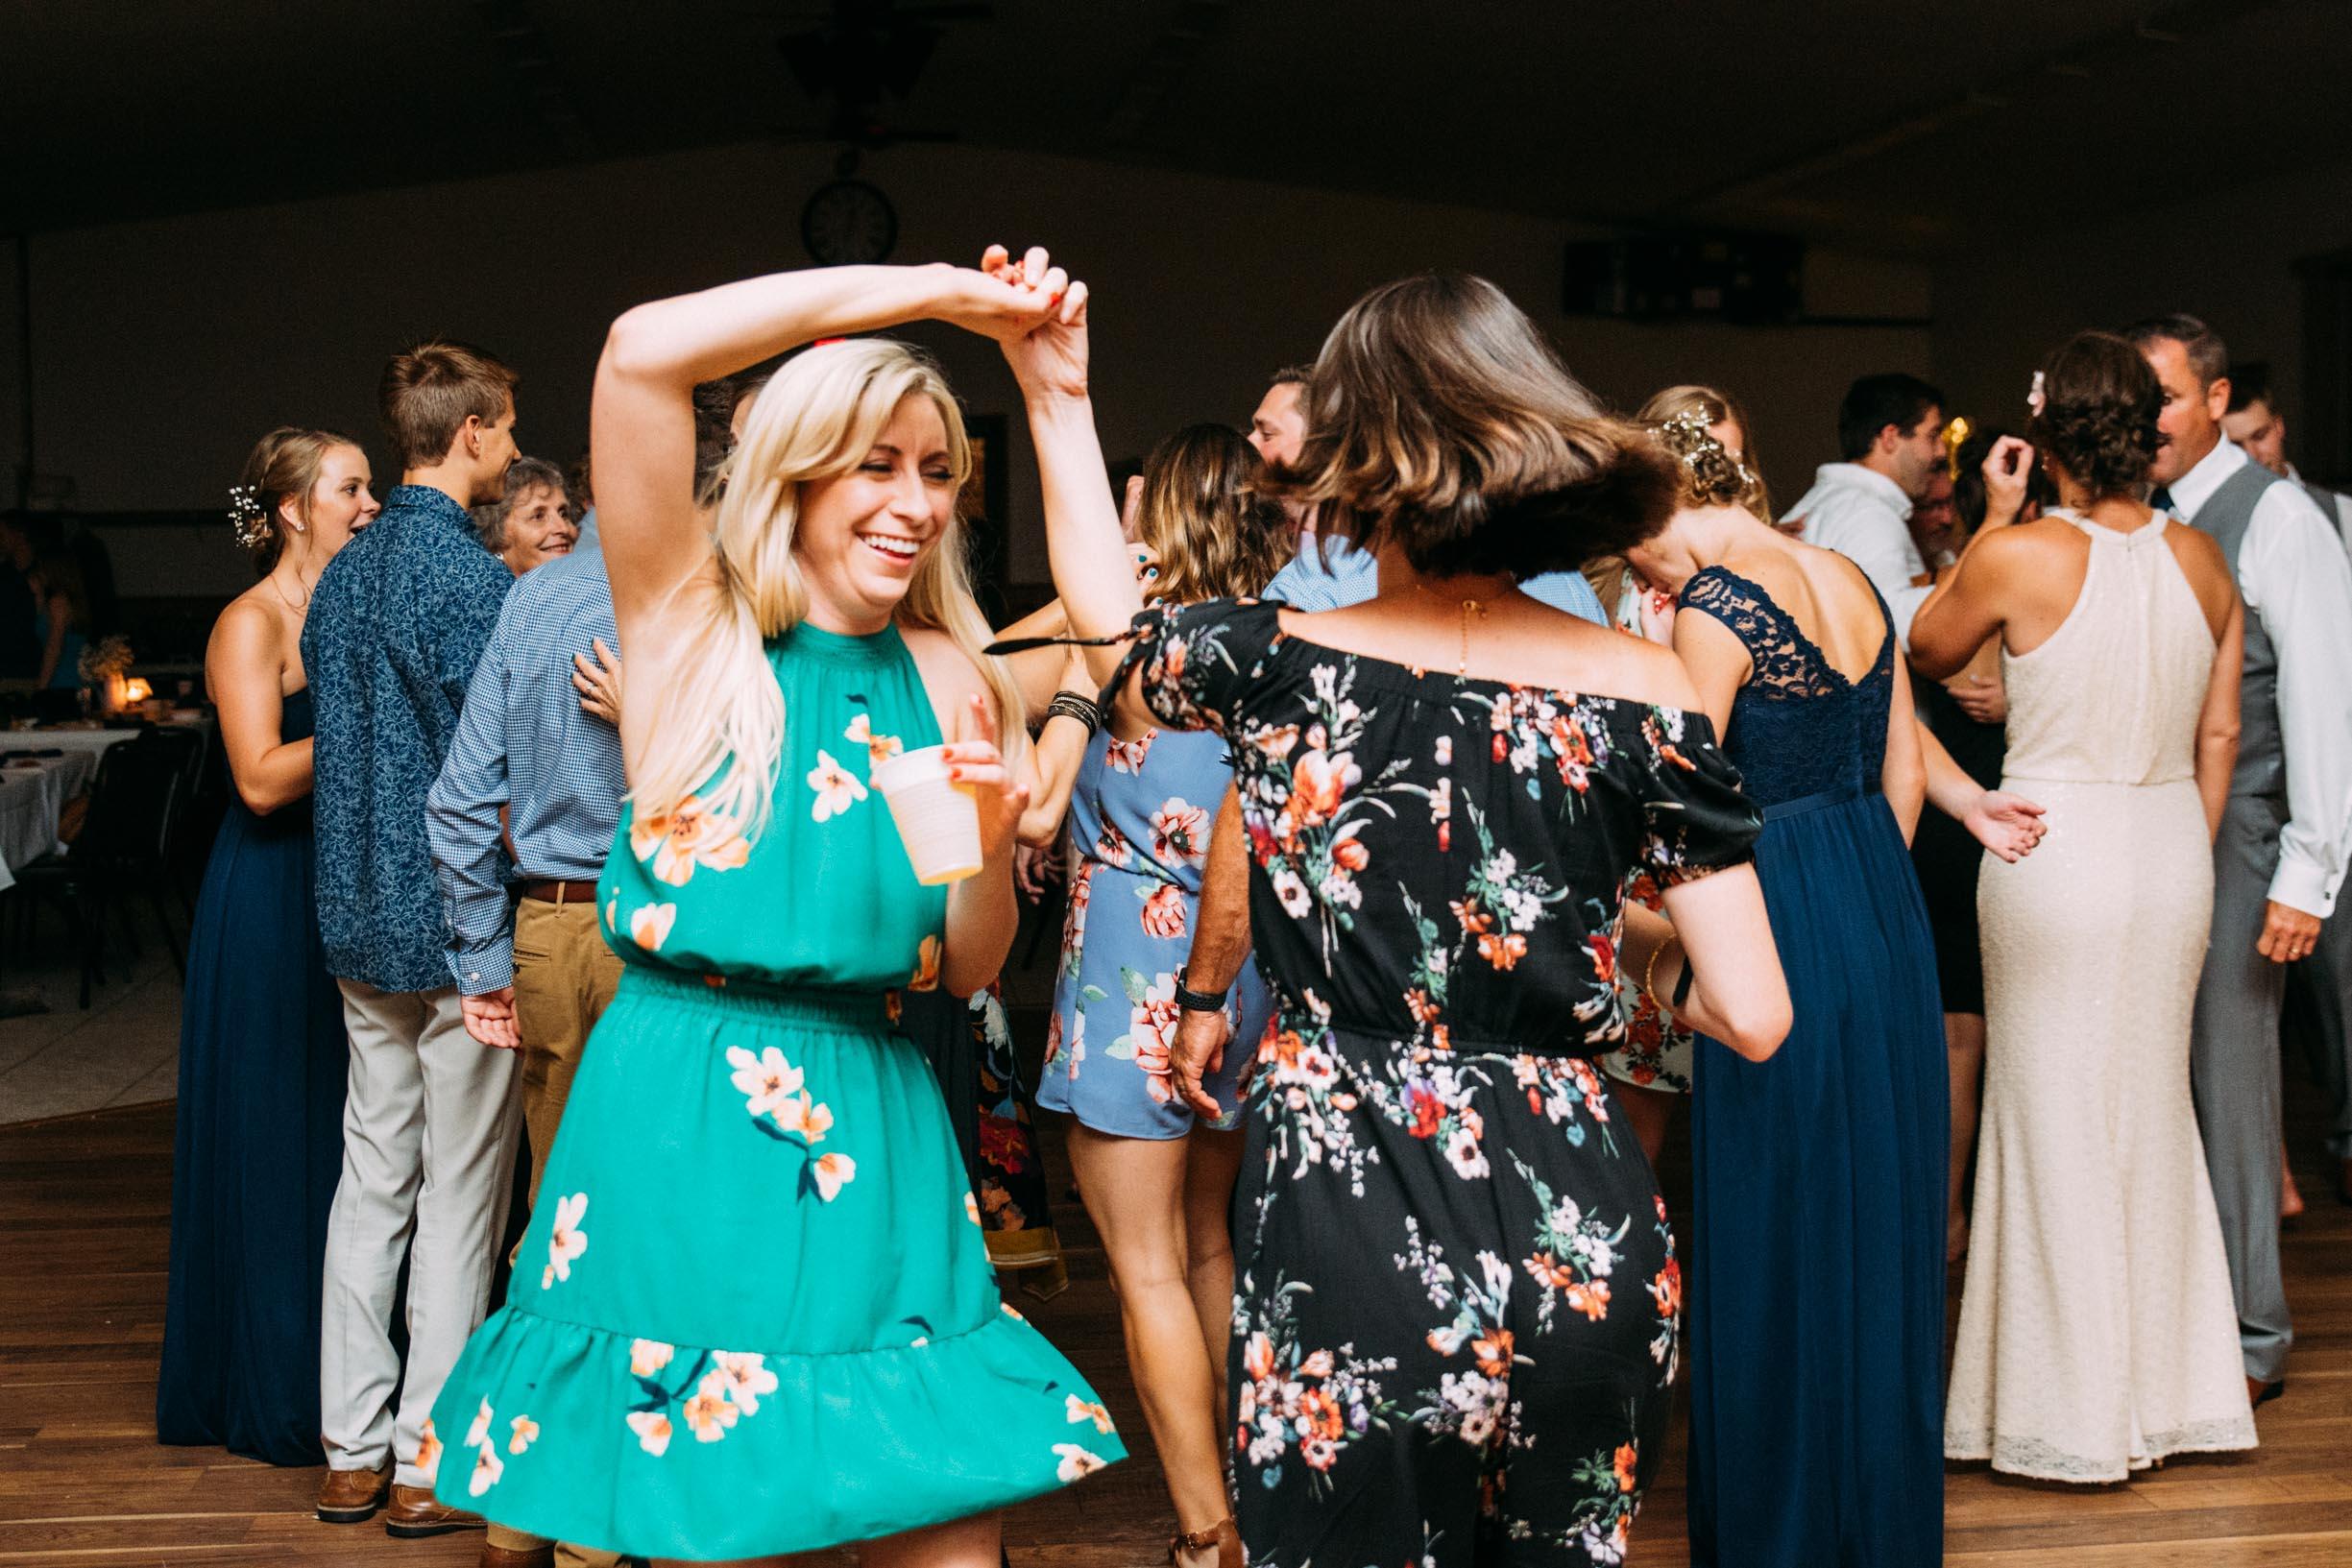 43-Lindsey Jake Wedding Reception Winona_.jpg